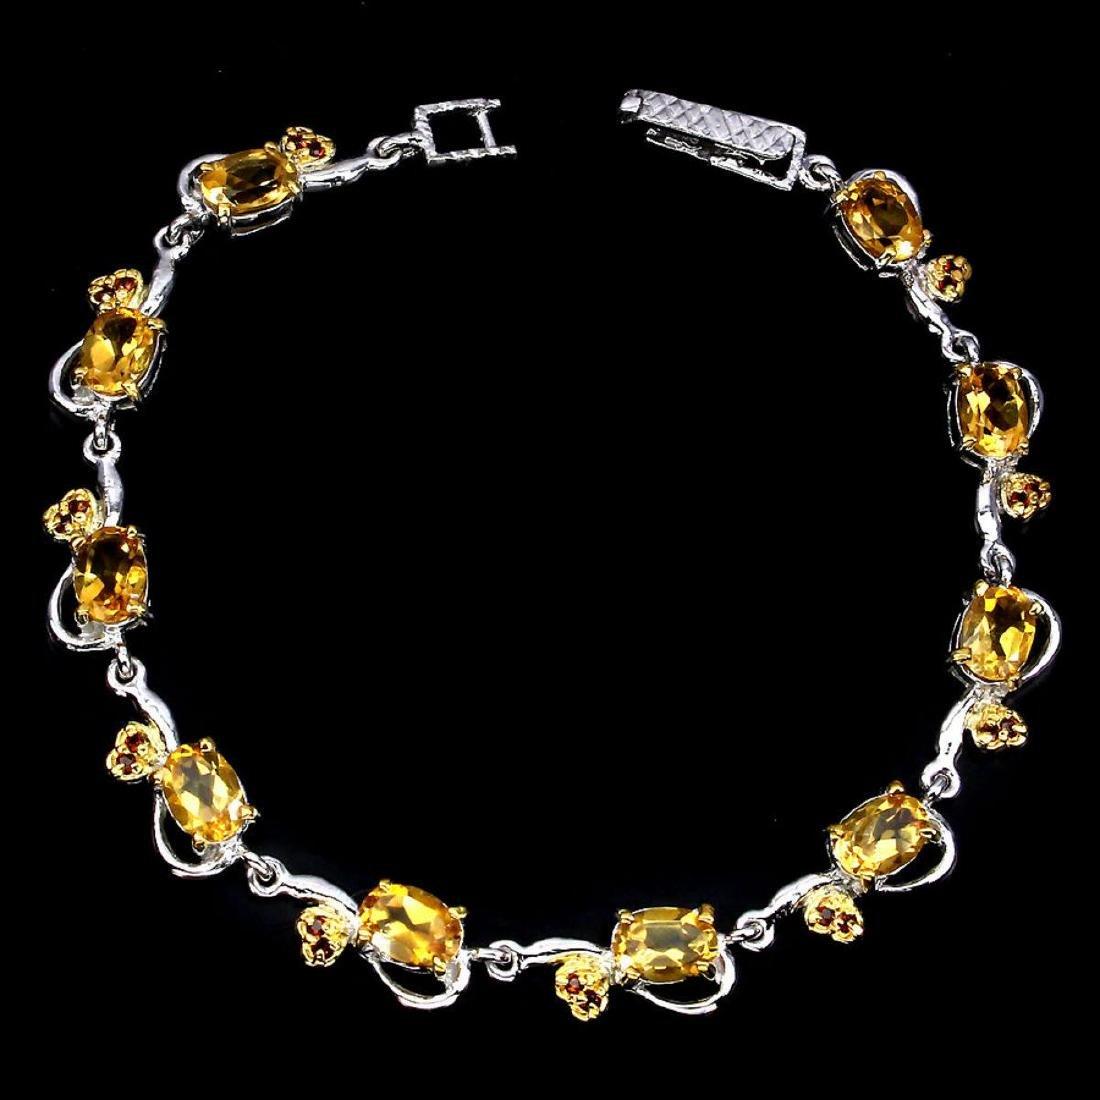 Natural Oval Yellow Citrine Garnet 64 Carats Bracelet - 2